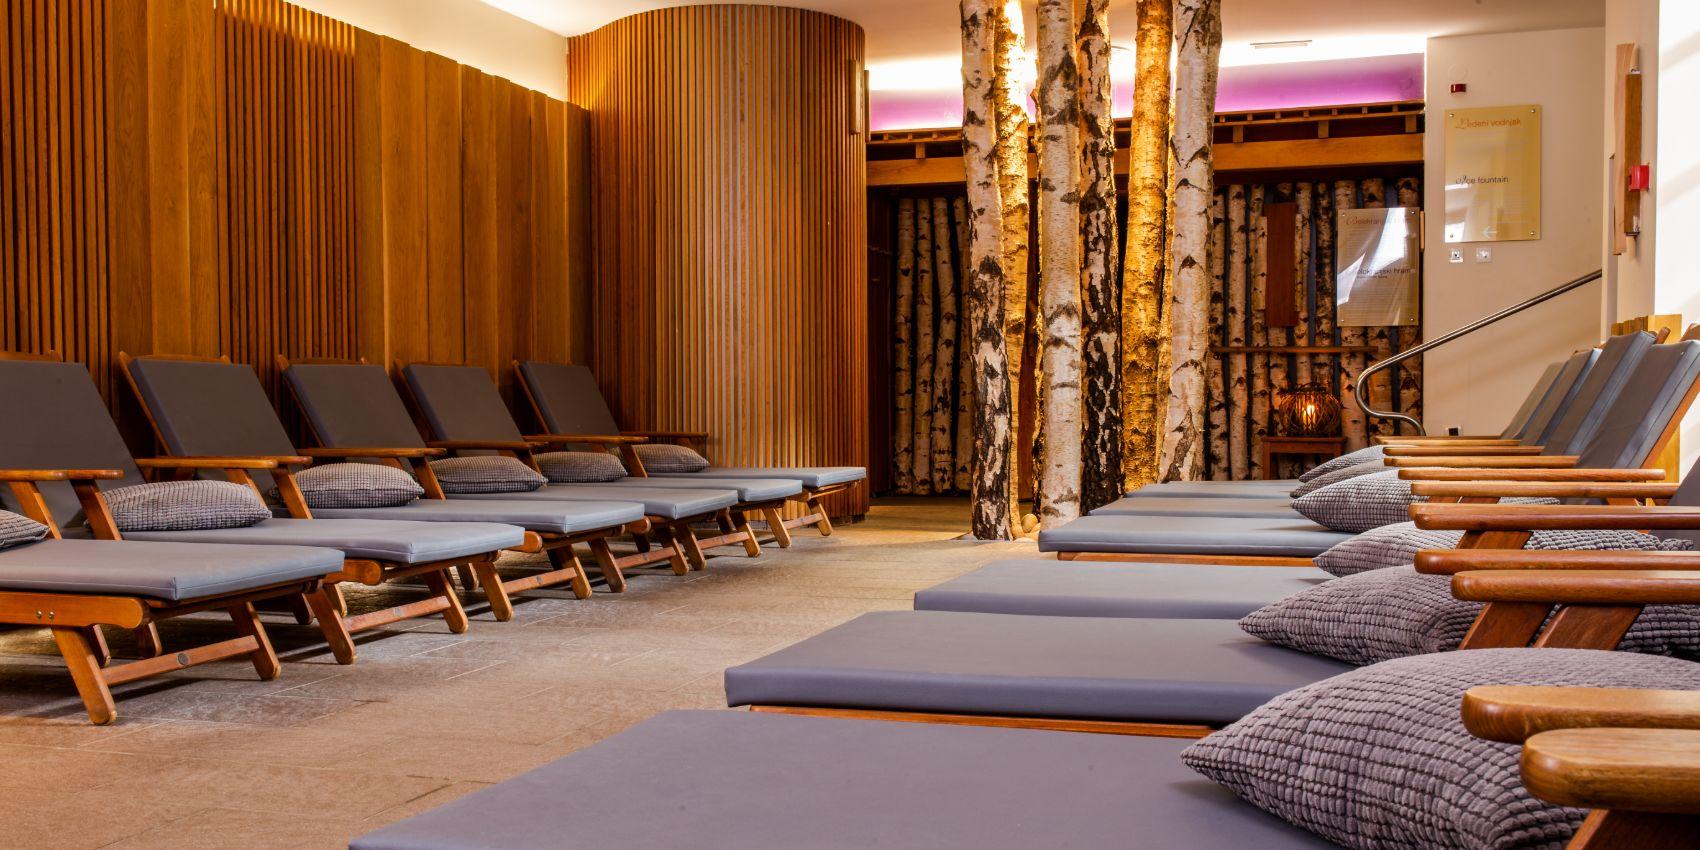 Relaxruimte in het Sloveense spa resort Terme Smarjeske Toplice.